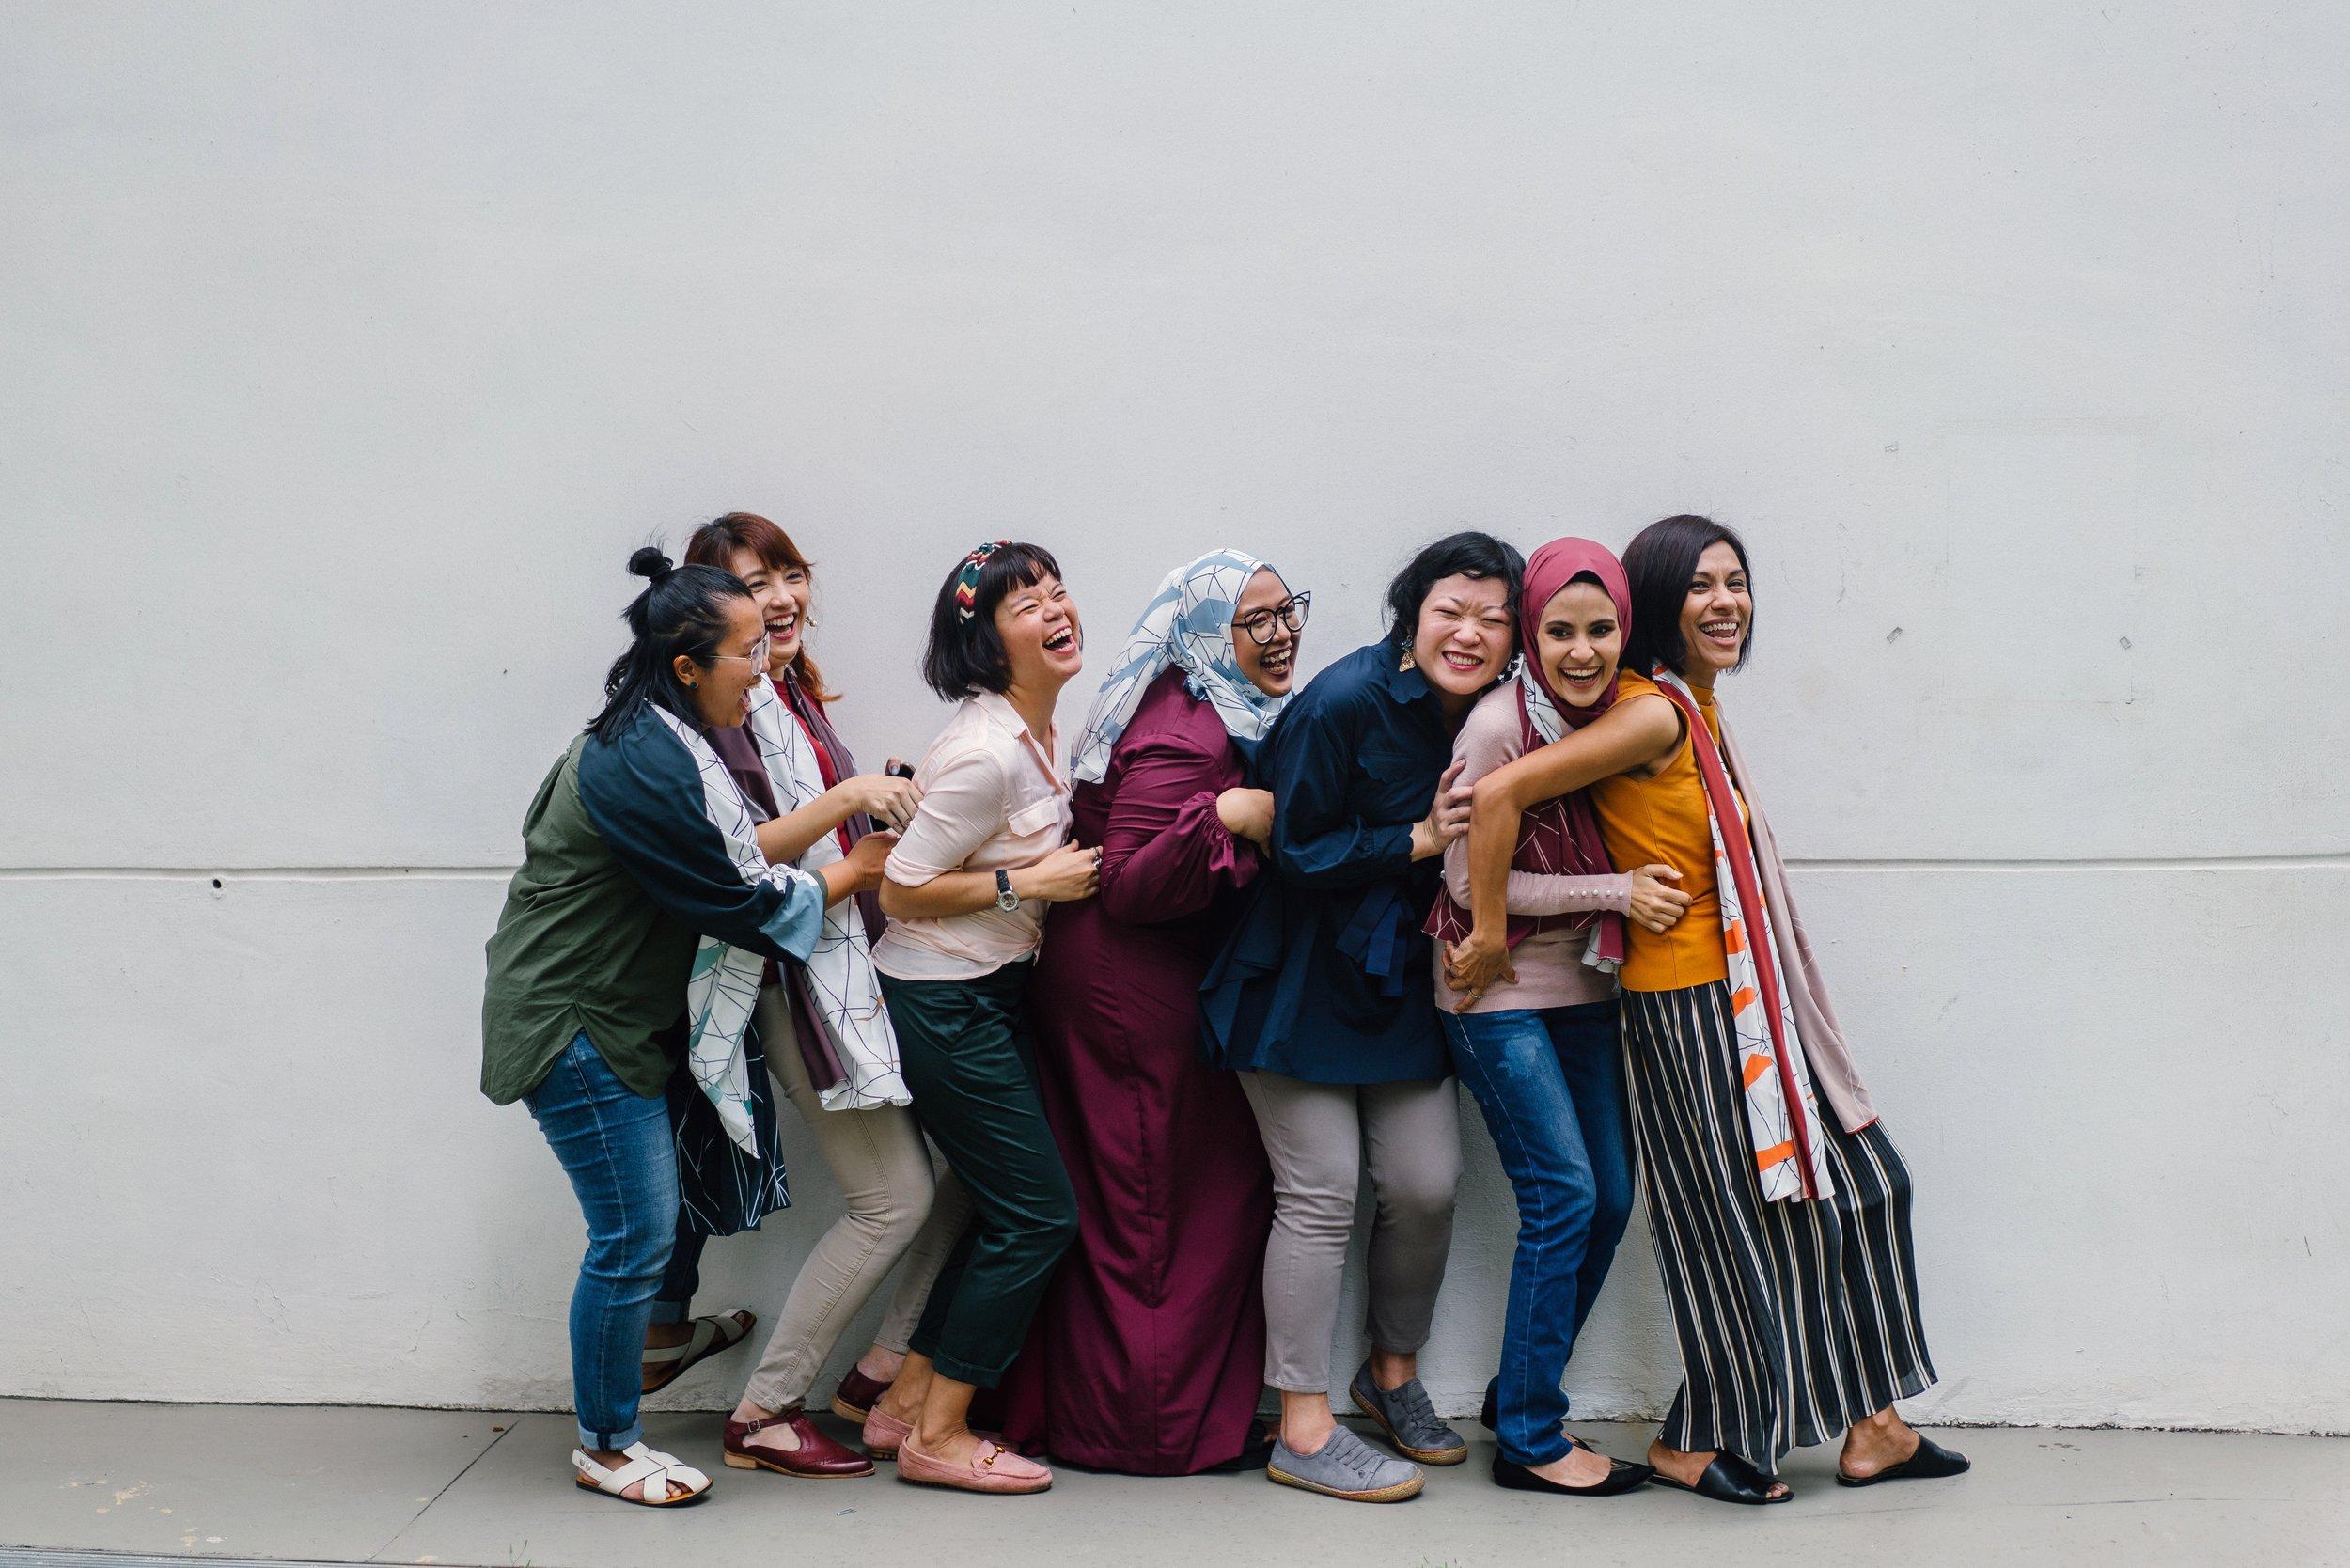 casual-diversity-female-1206059.jpg